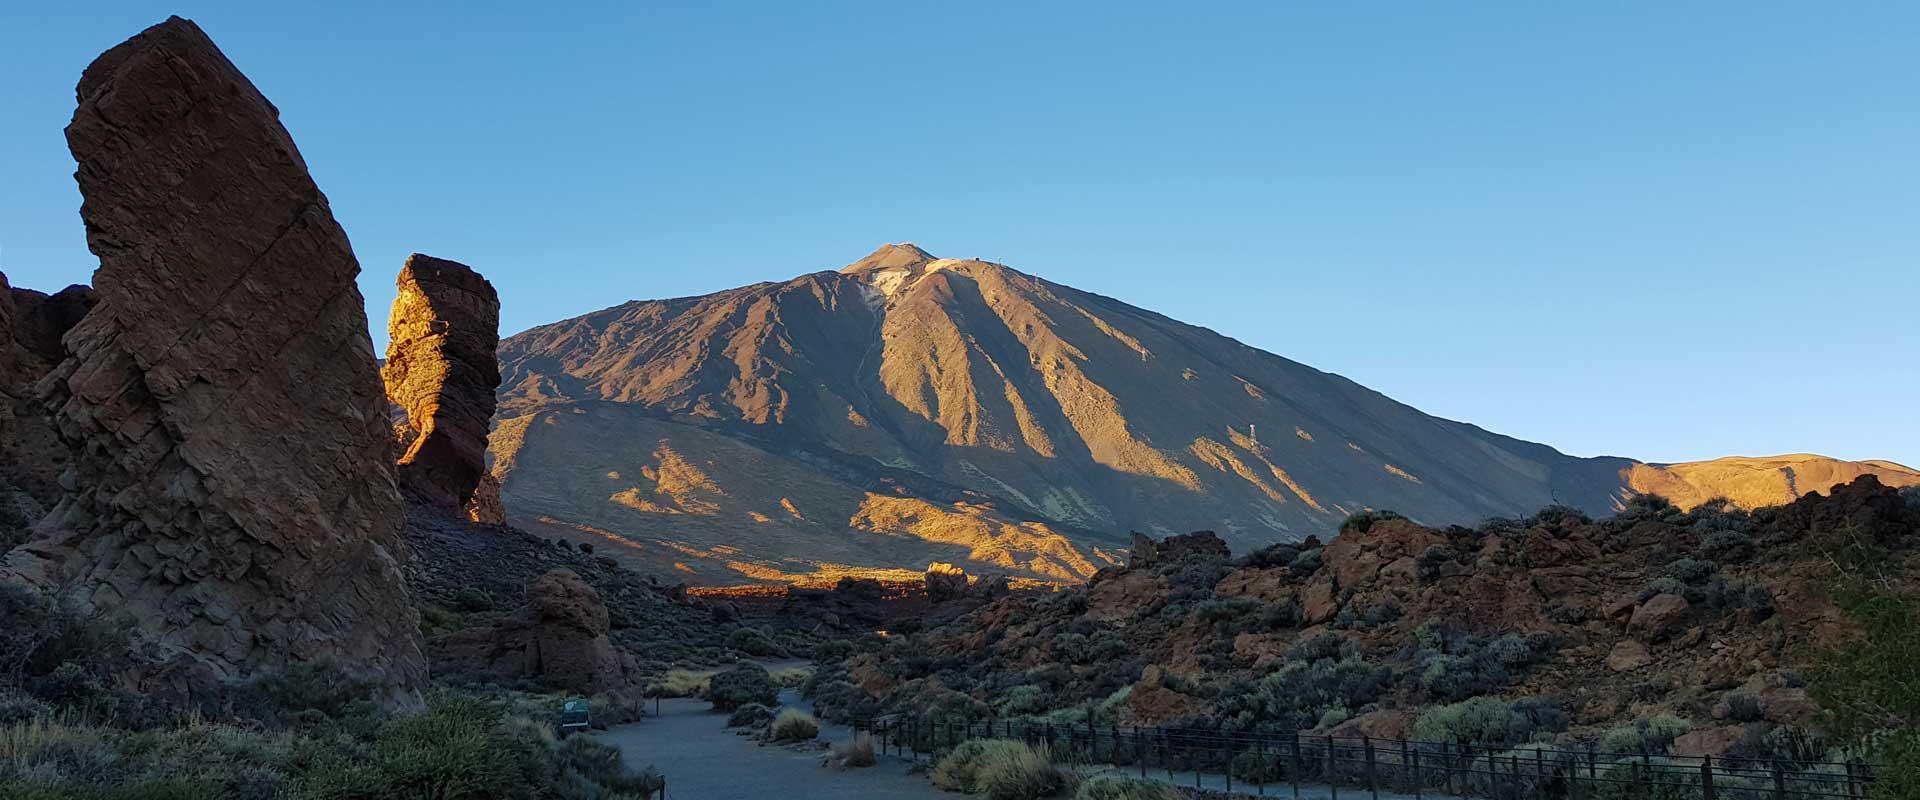 Tenerife: hike & drive